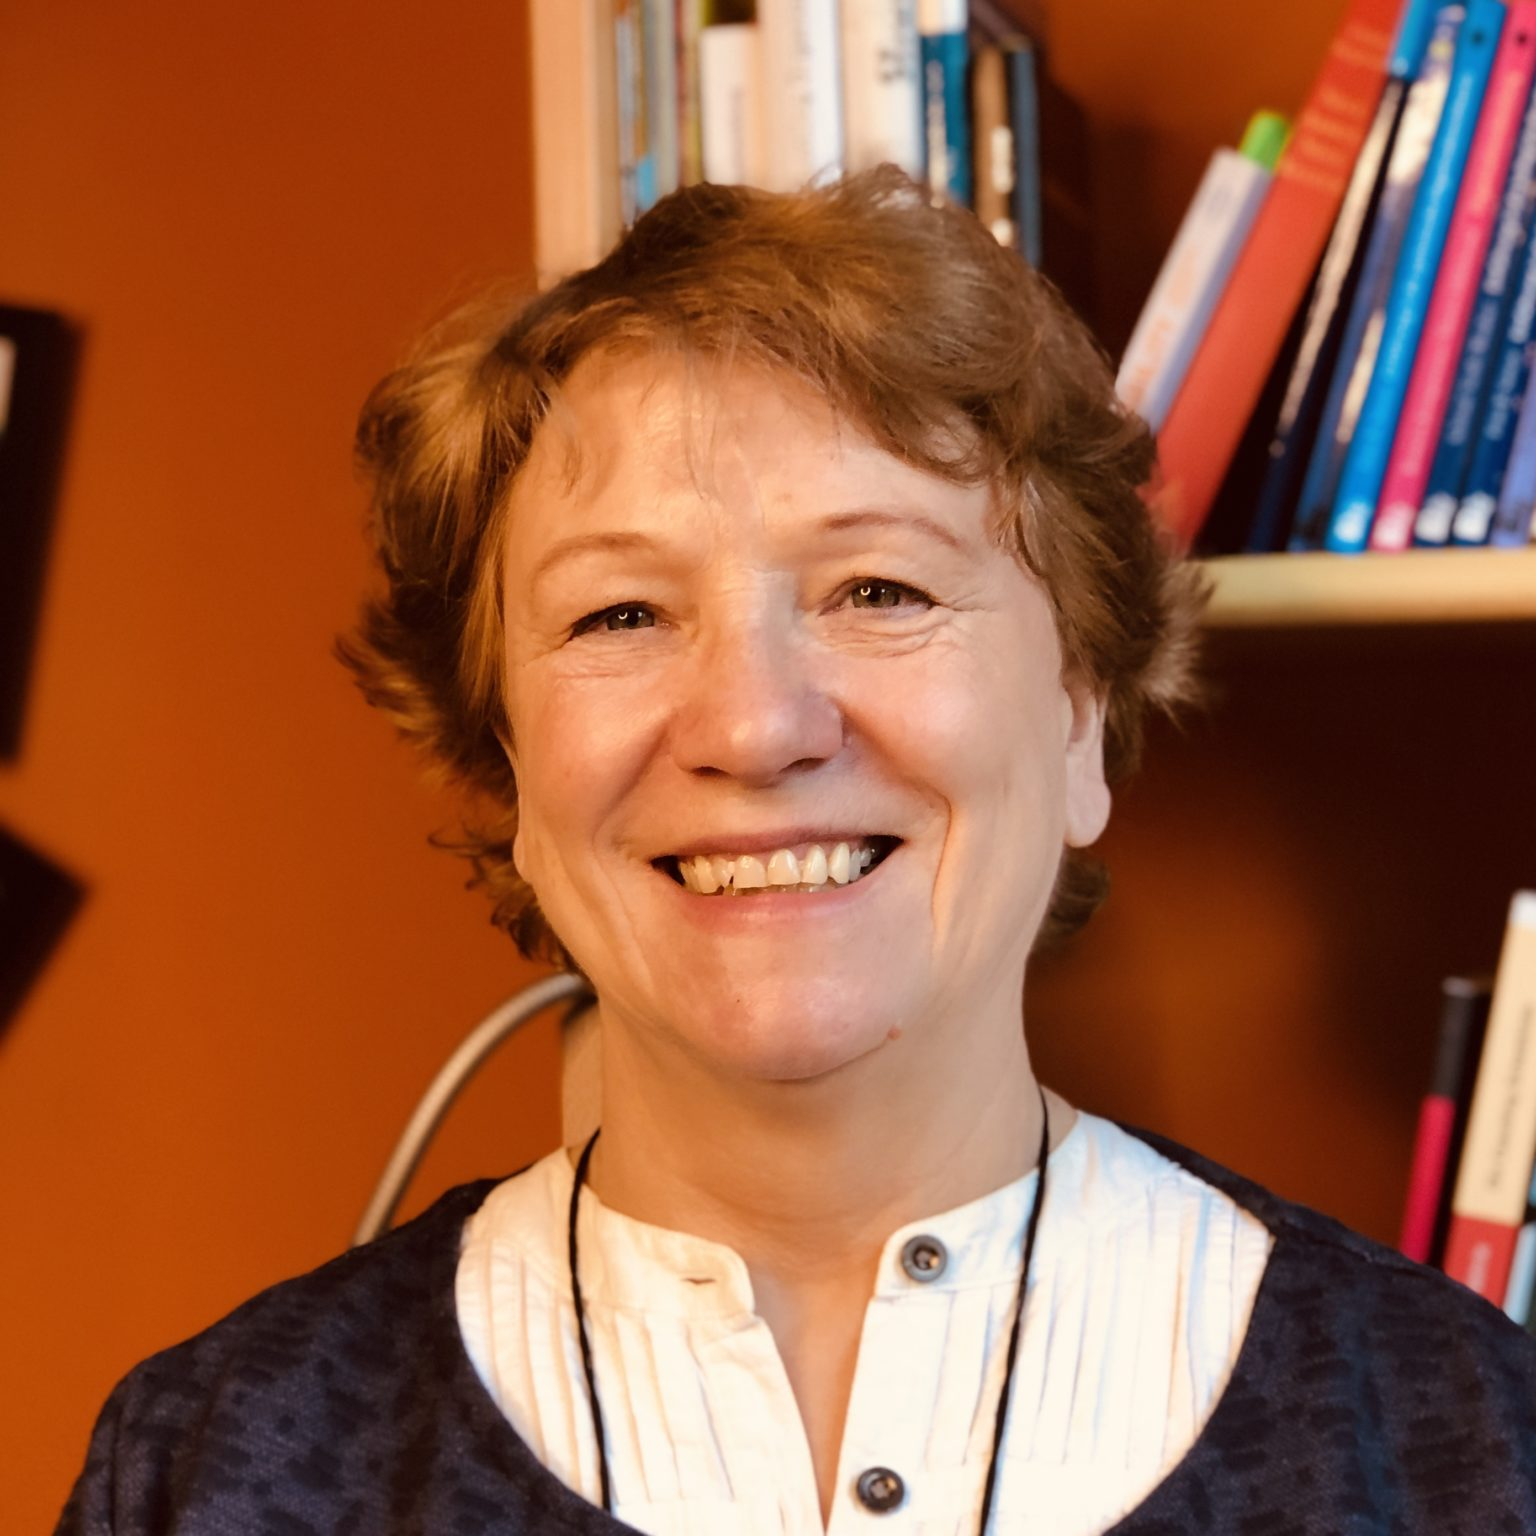 Dr. Irina Gühne